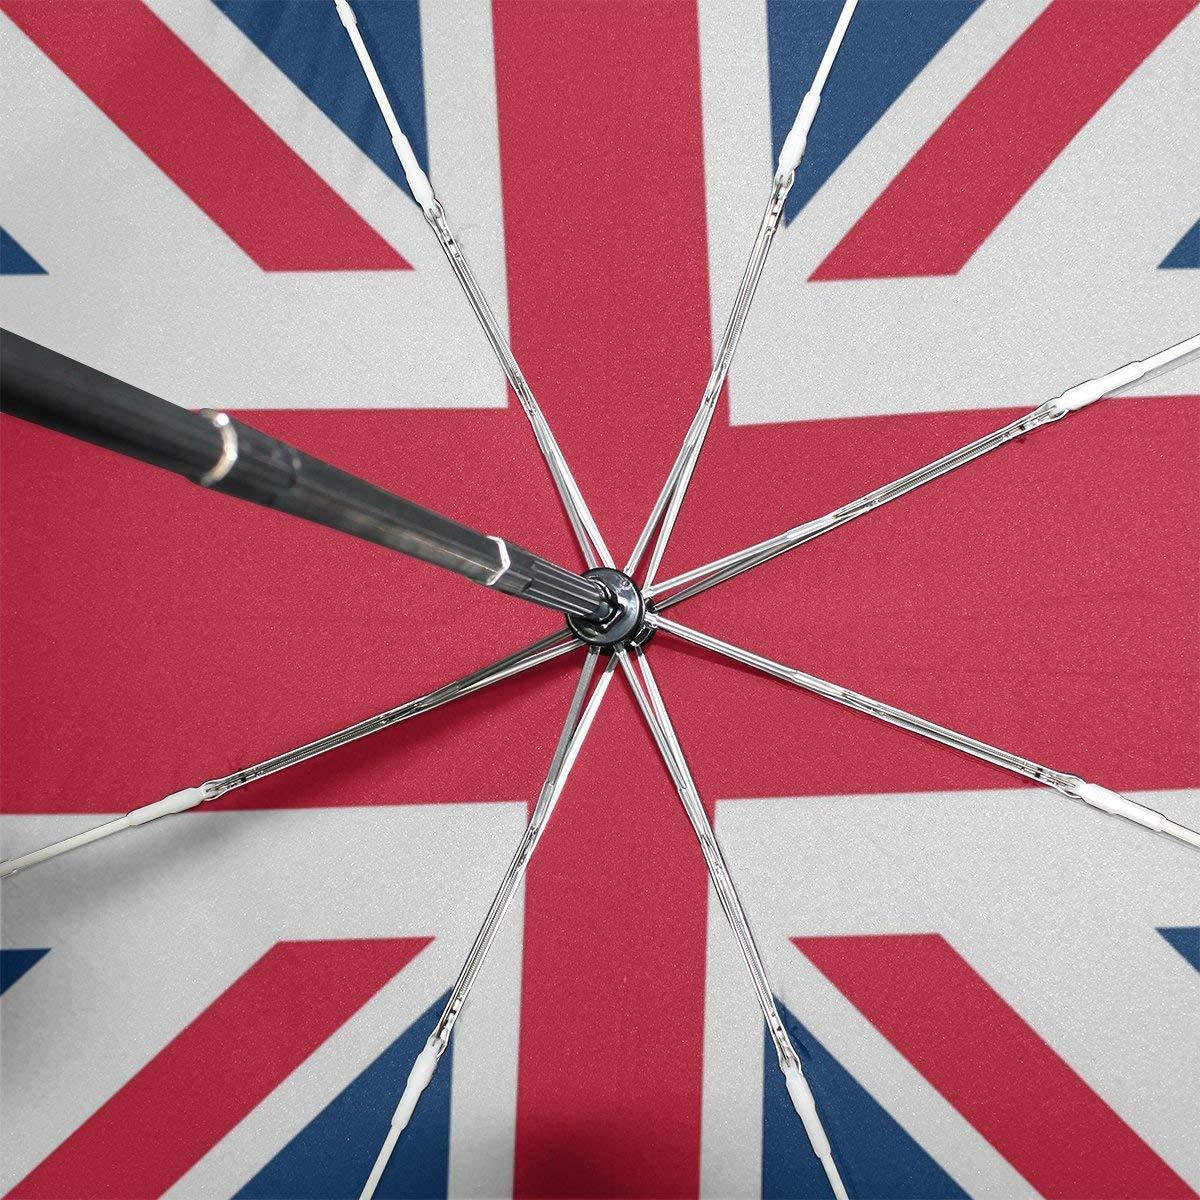 e2445b29ff23 WOZO Retro Union Jack British Flag 3 Folds Auto Open Close Umbrella